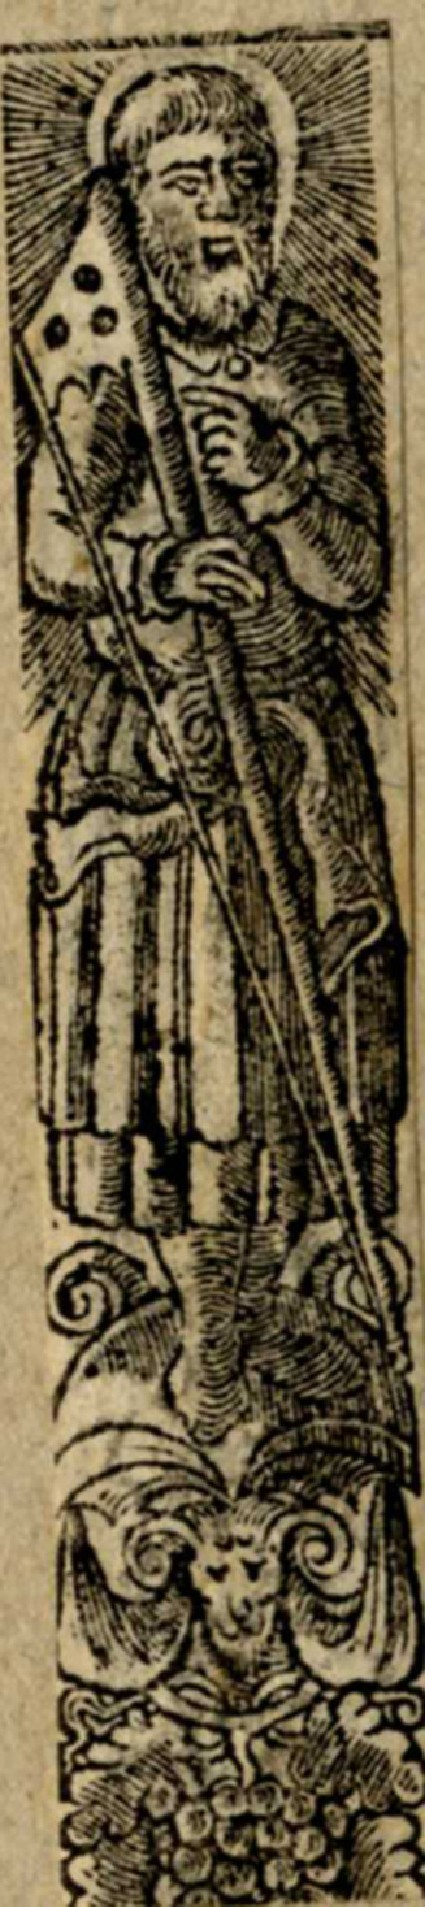 Male saint with a saw